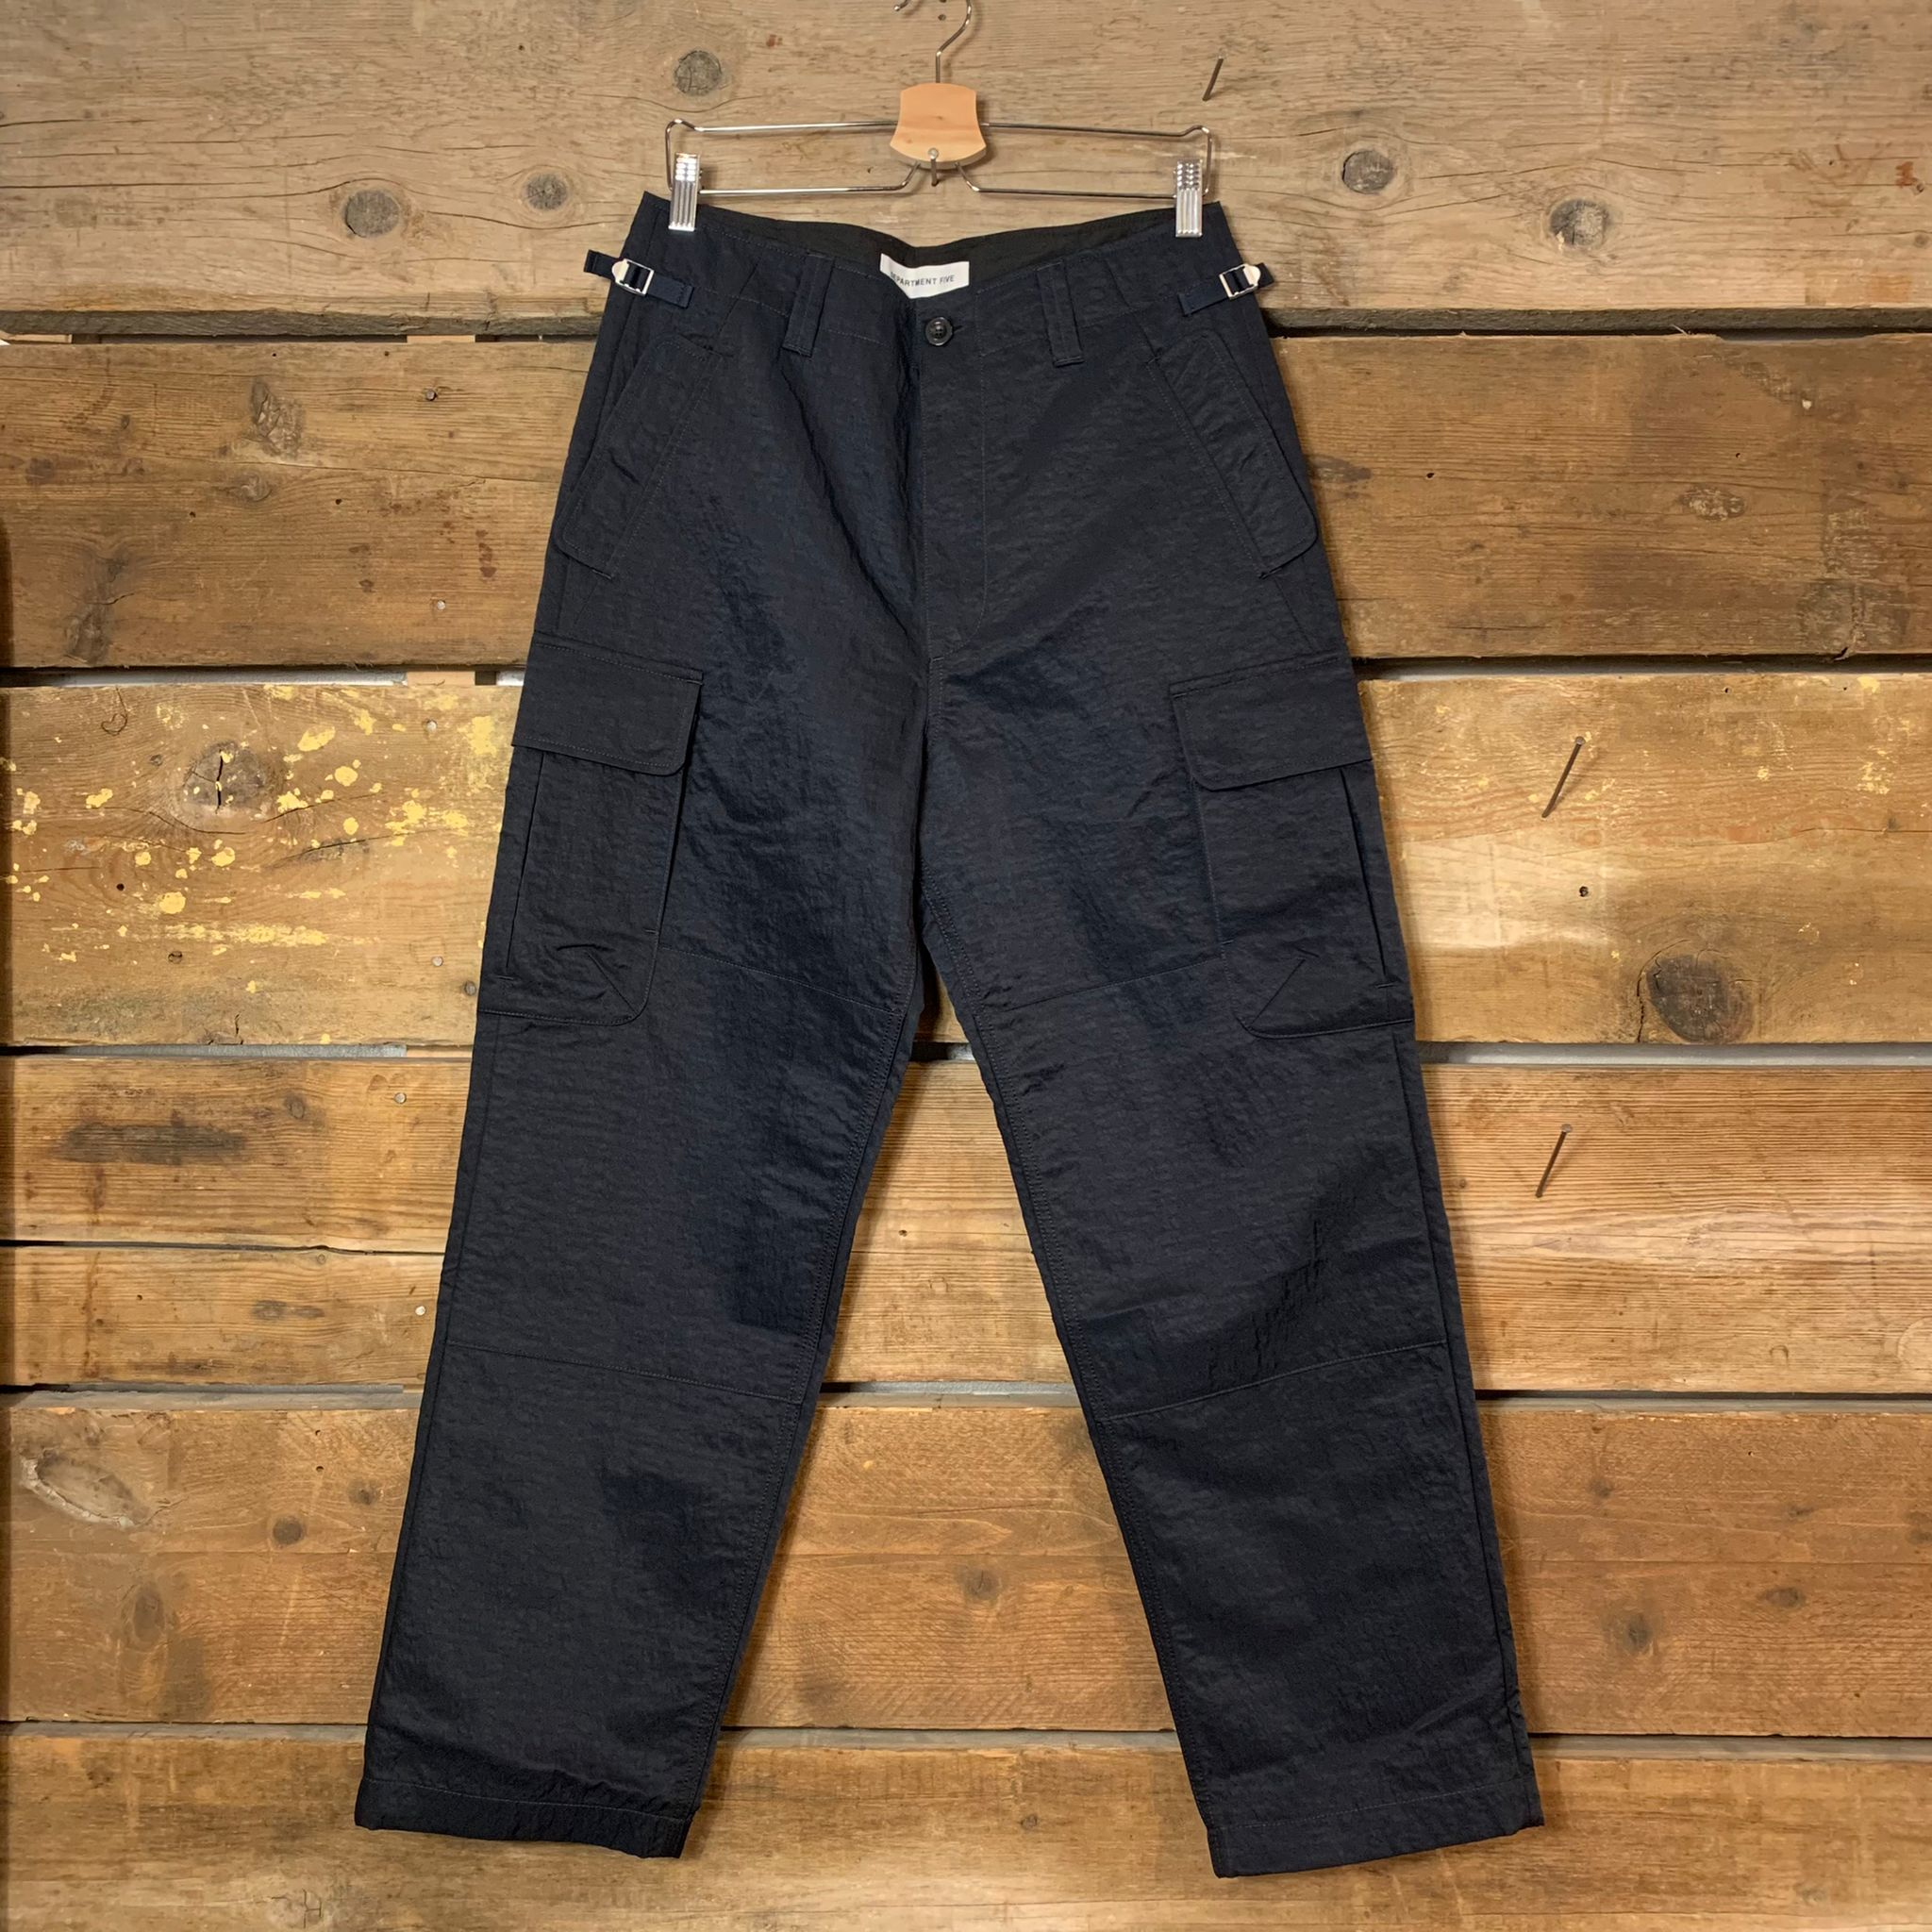 Pantalone Department 5 Spartan Cargo Navy